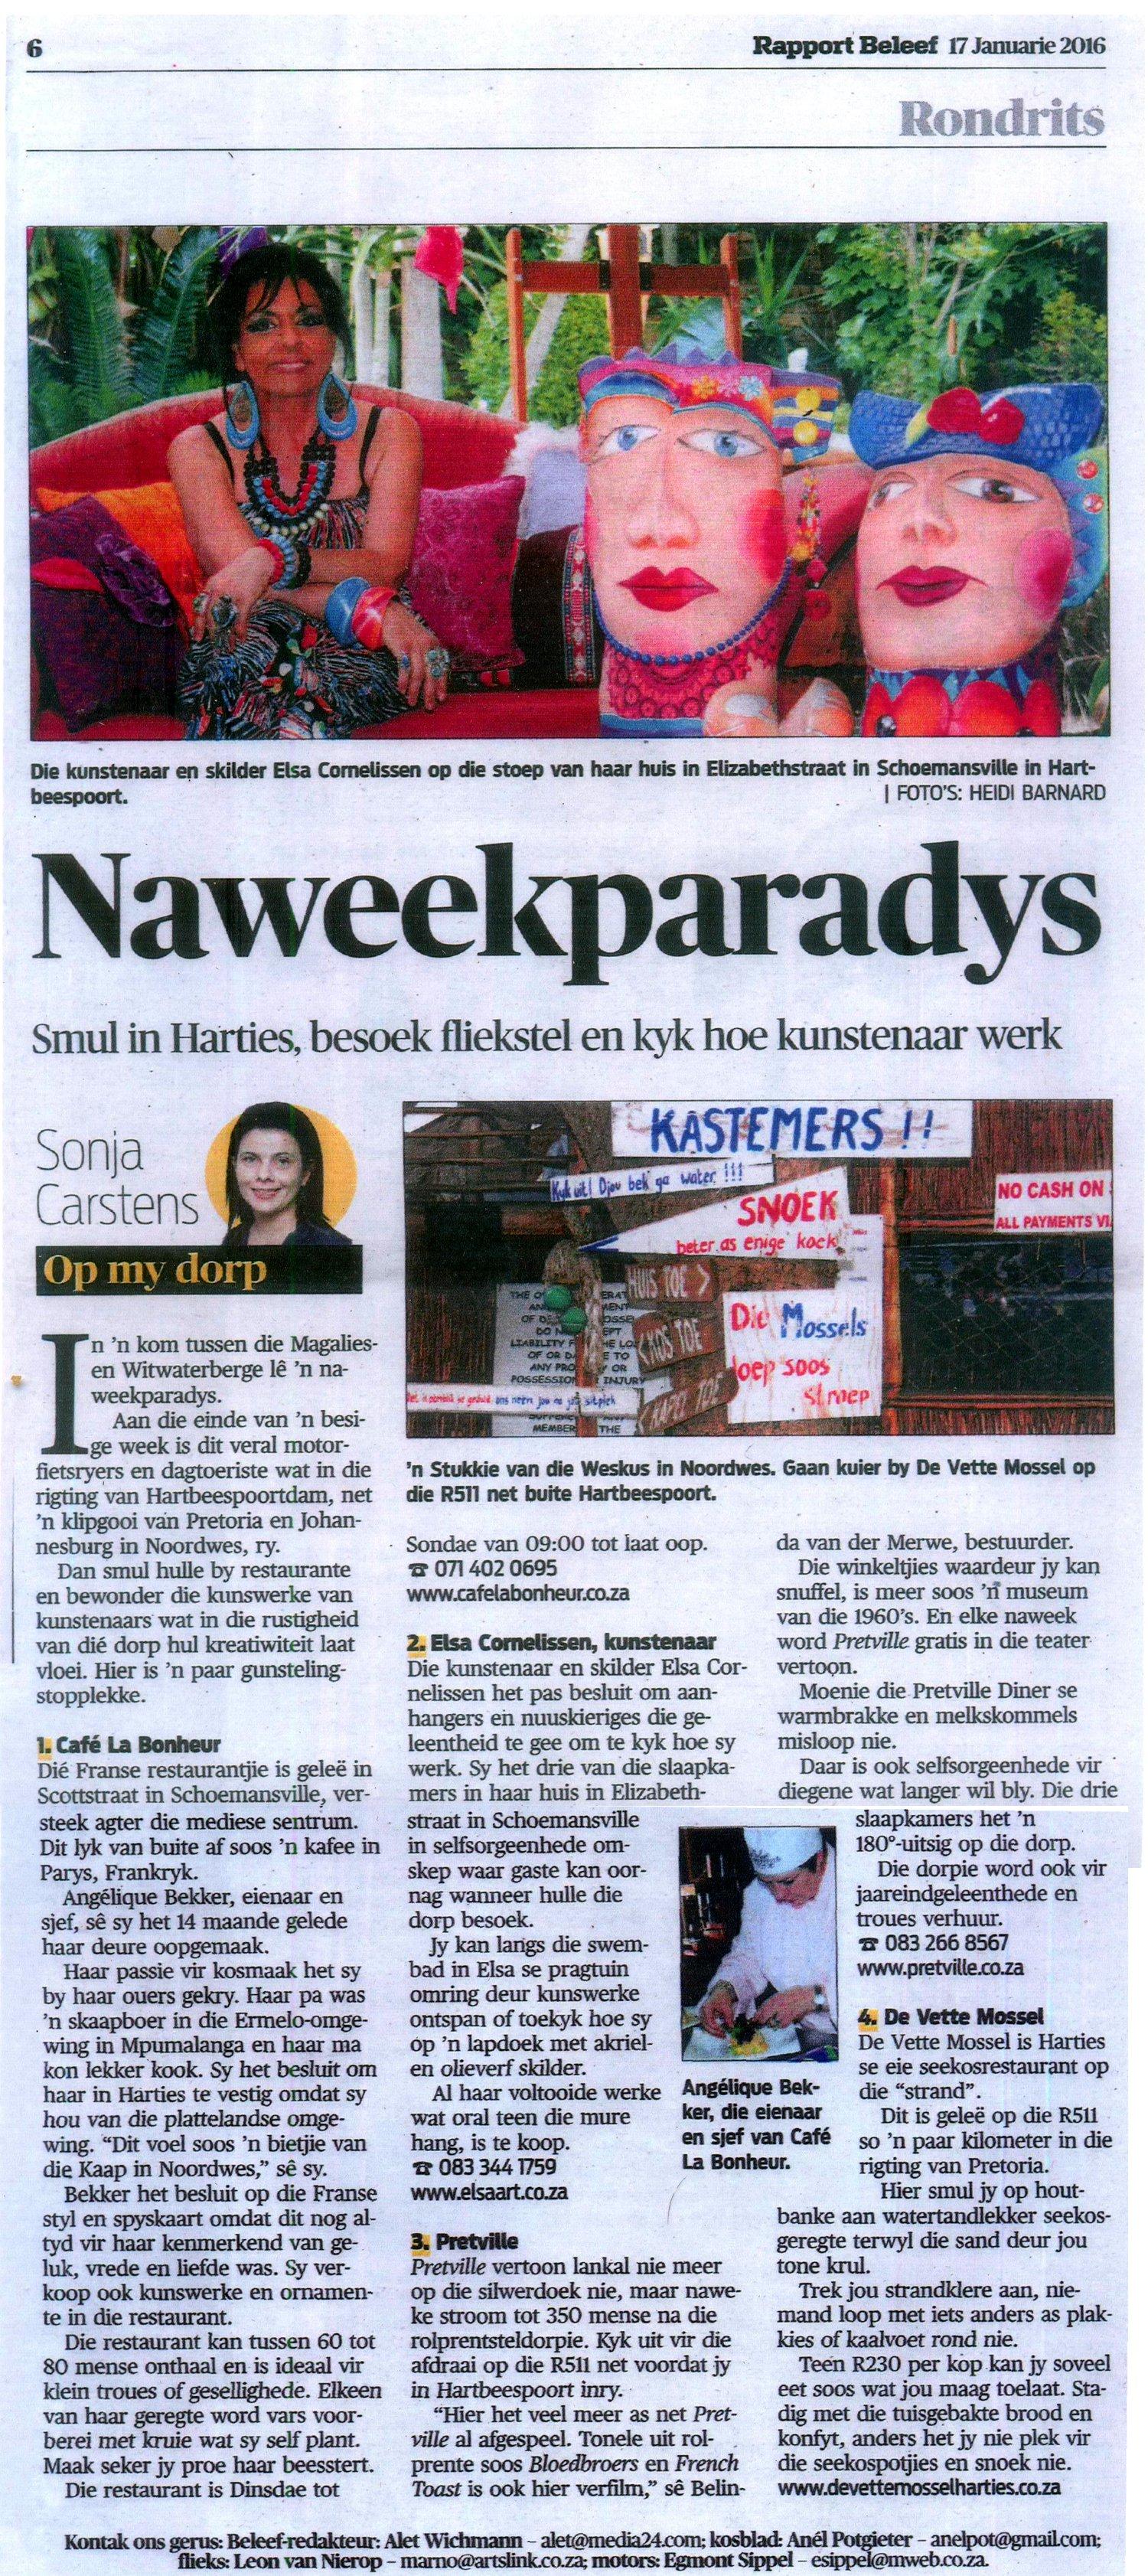 Naweekparadys